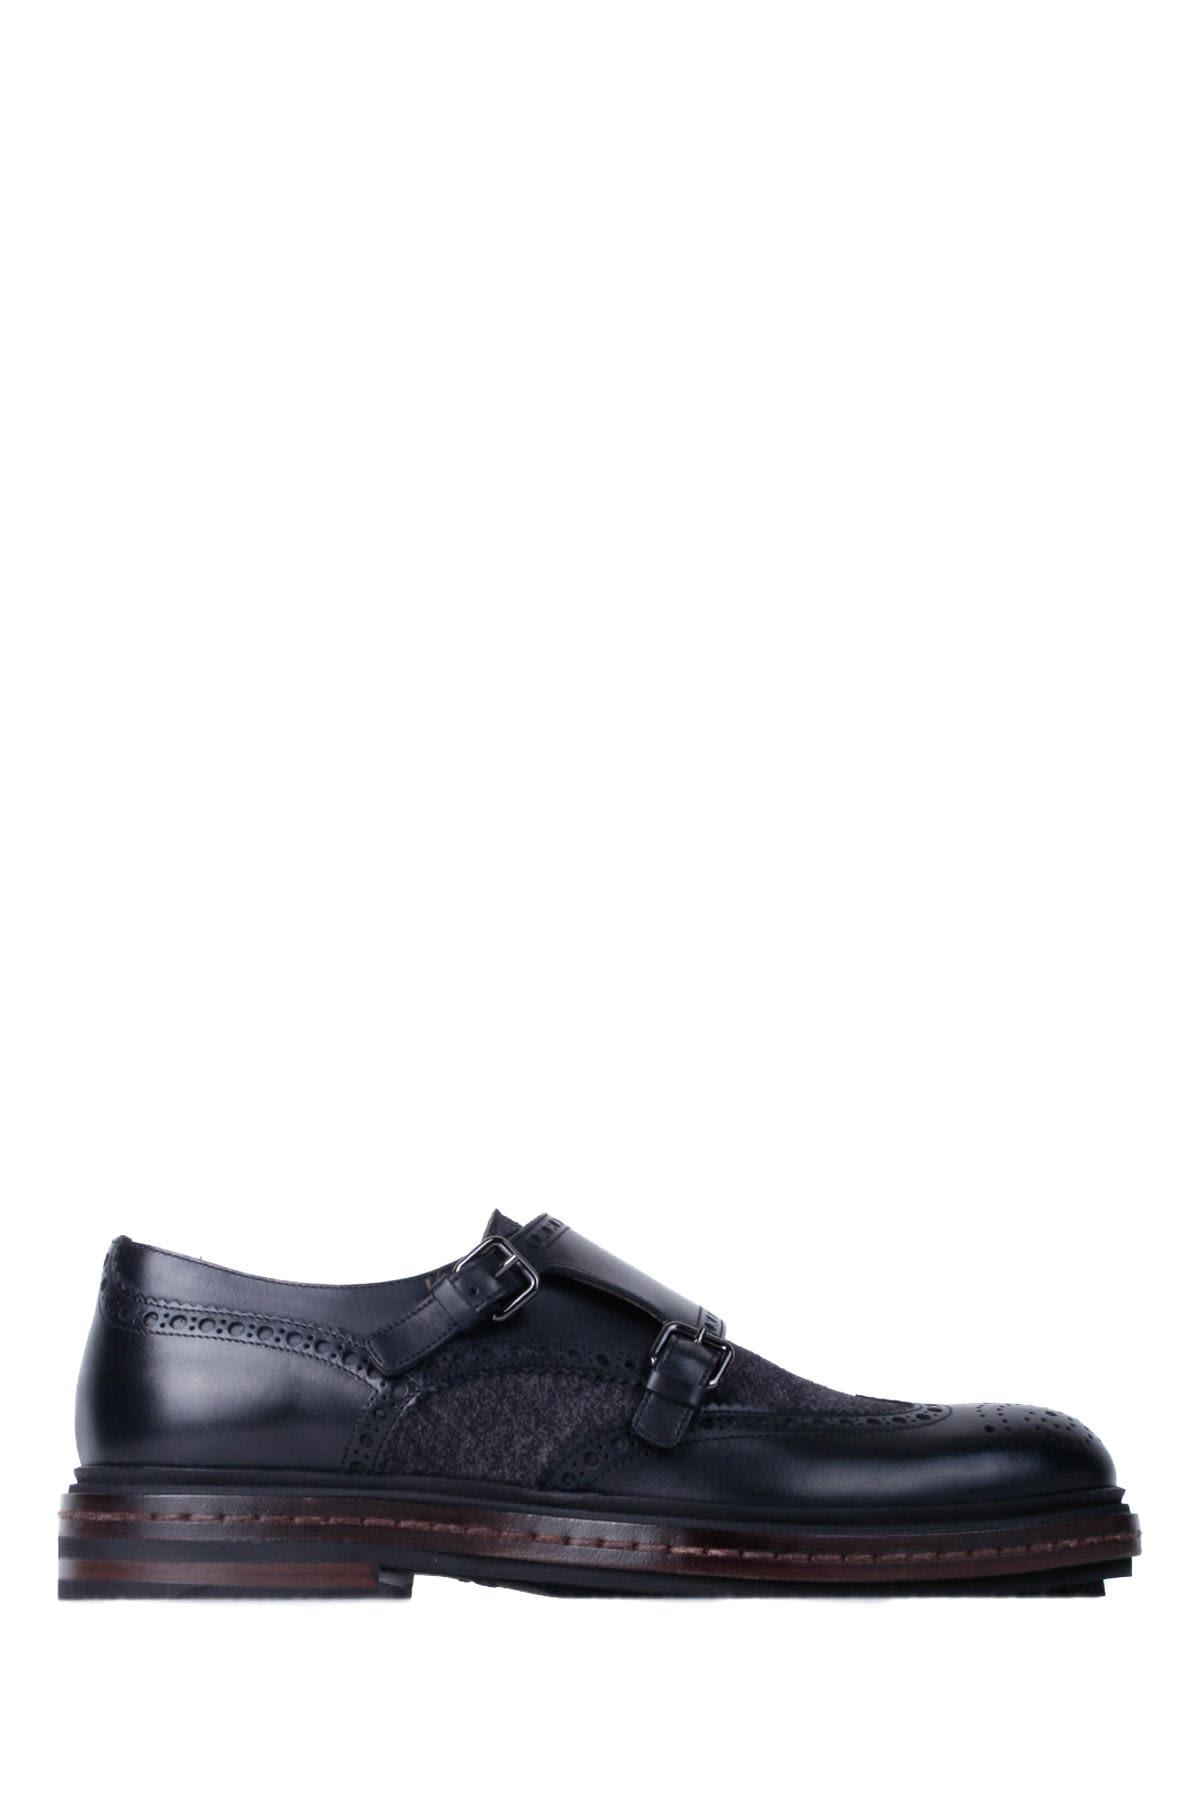 Santoni Black-grey Leather Man Double-buckles Shoes